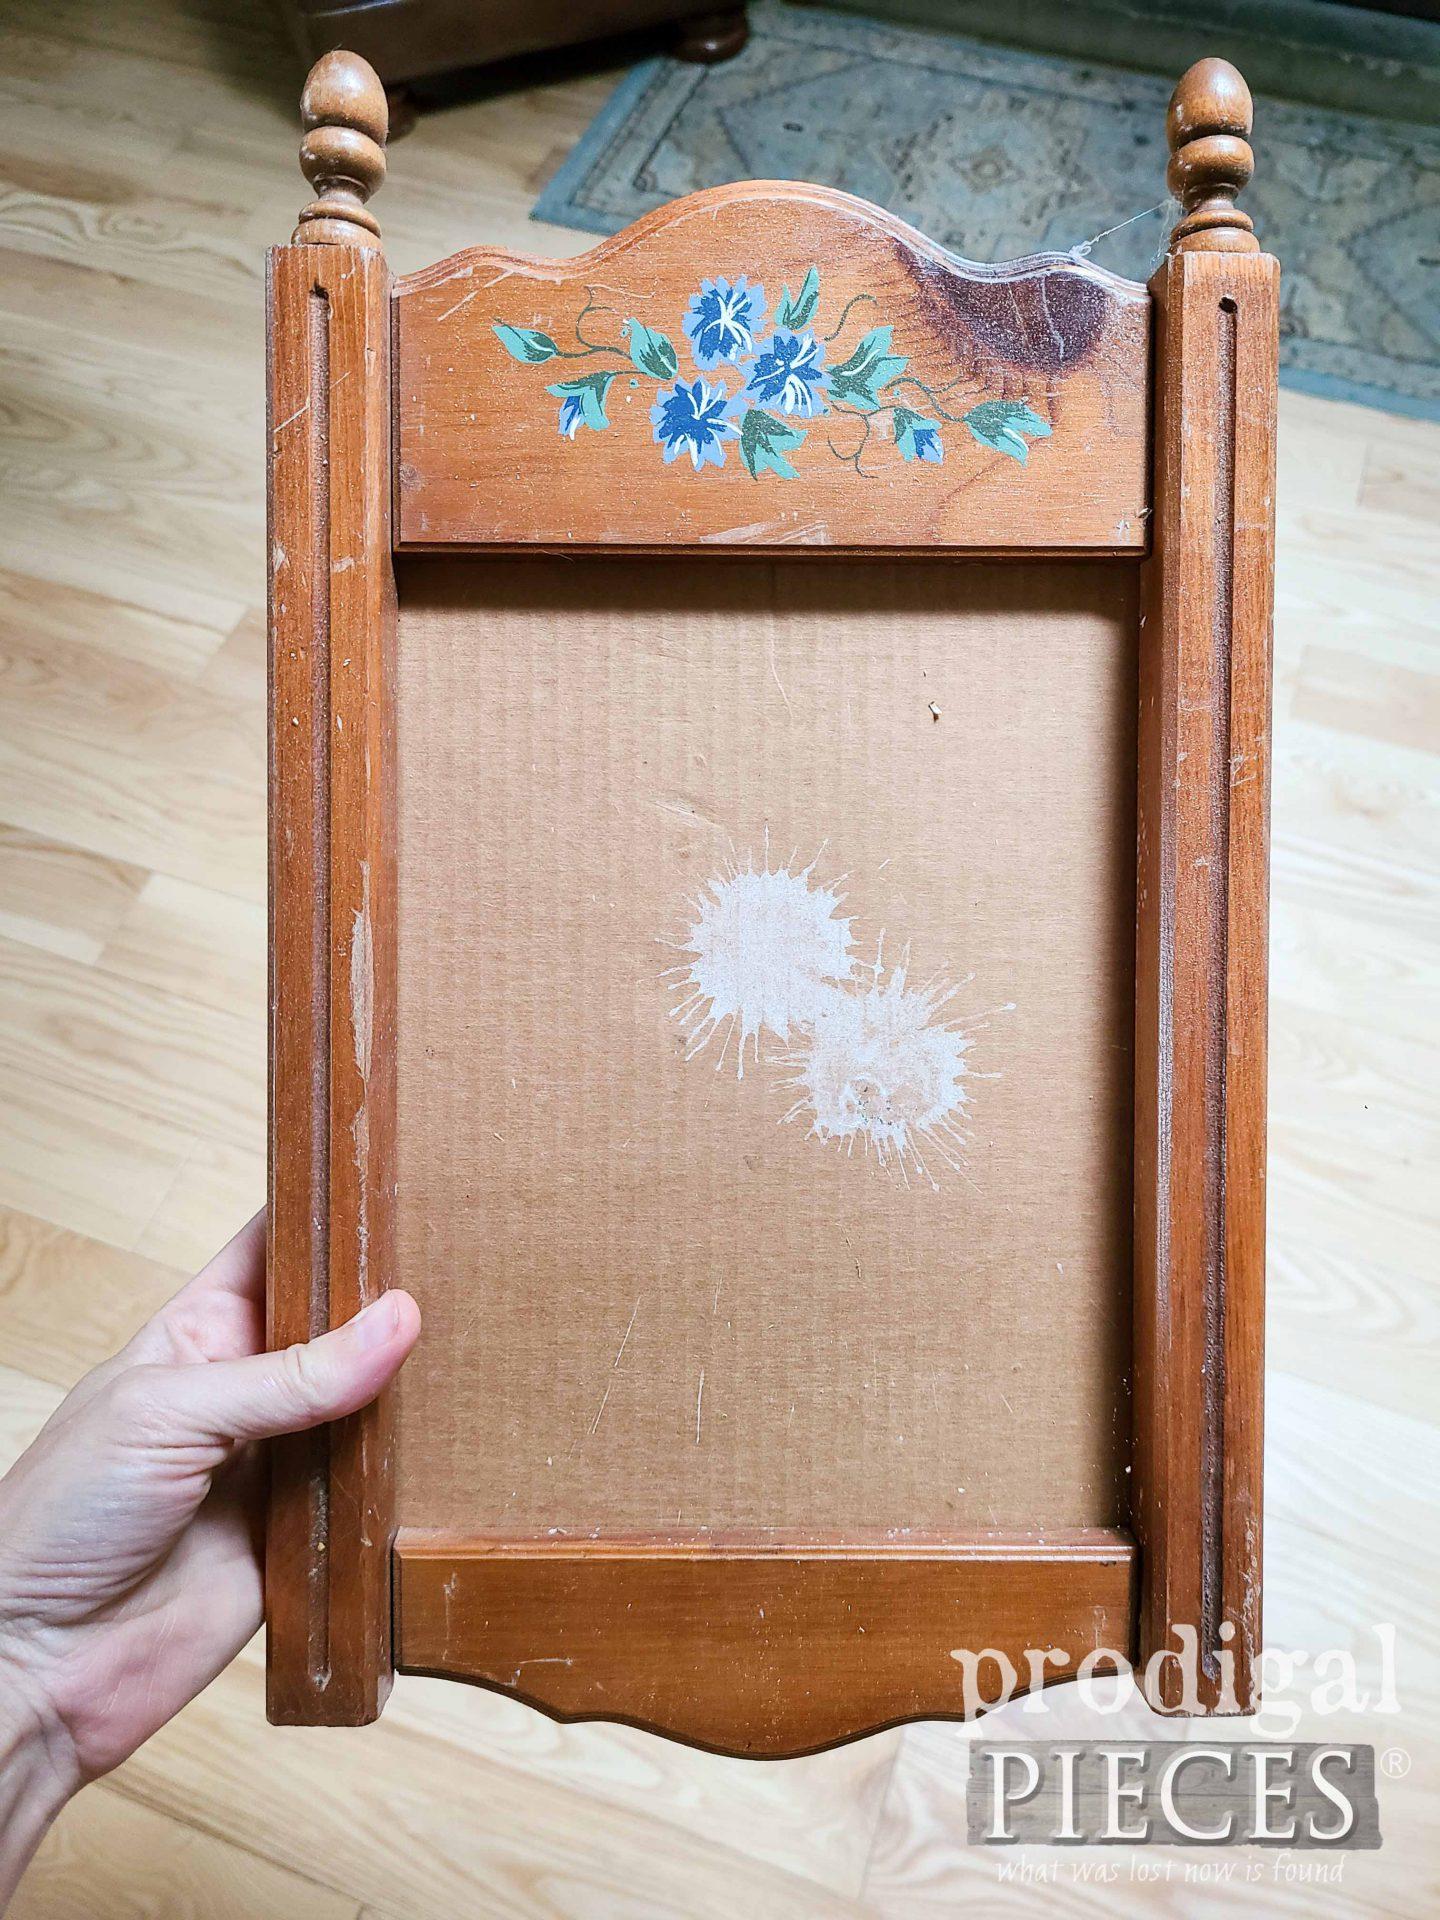 Thrifted Frame Before Makeover by Prodigal Pieces | prodigalpieces.com